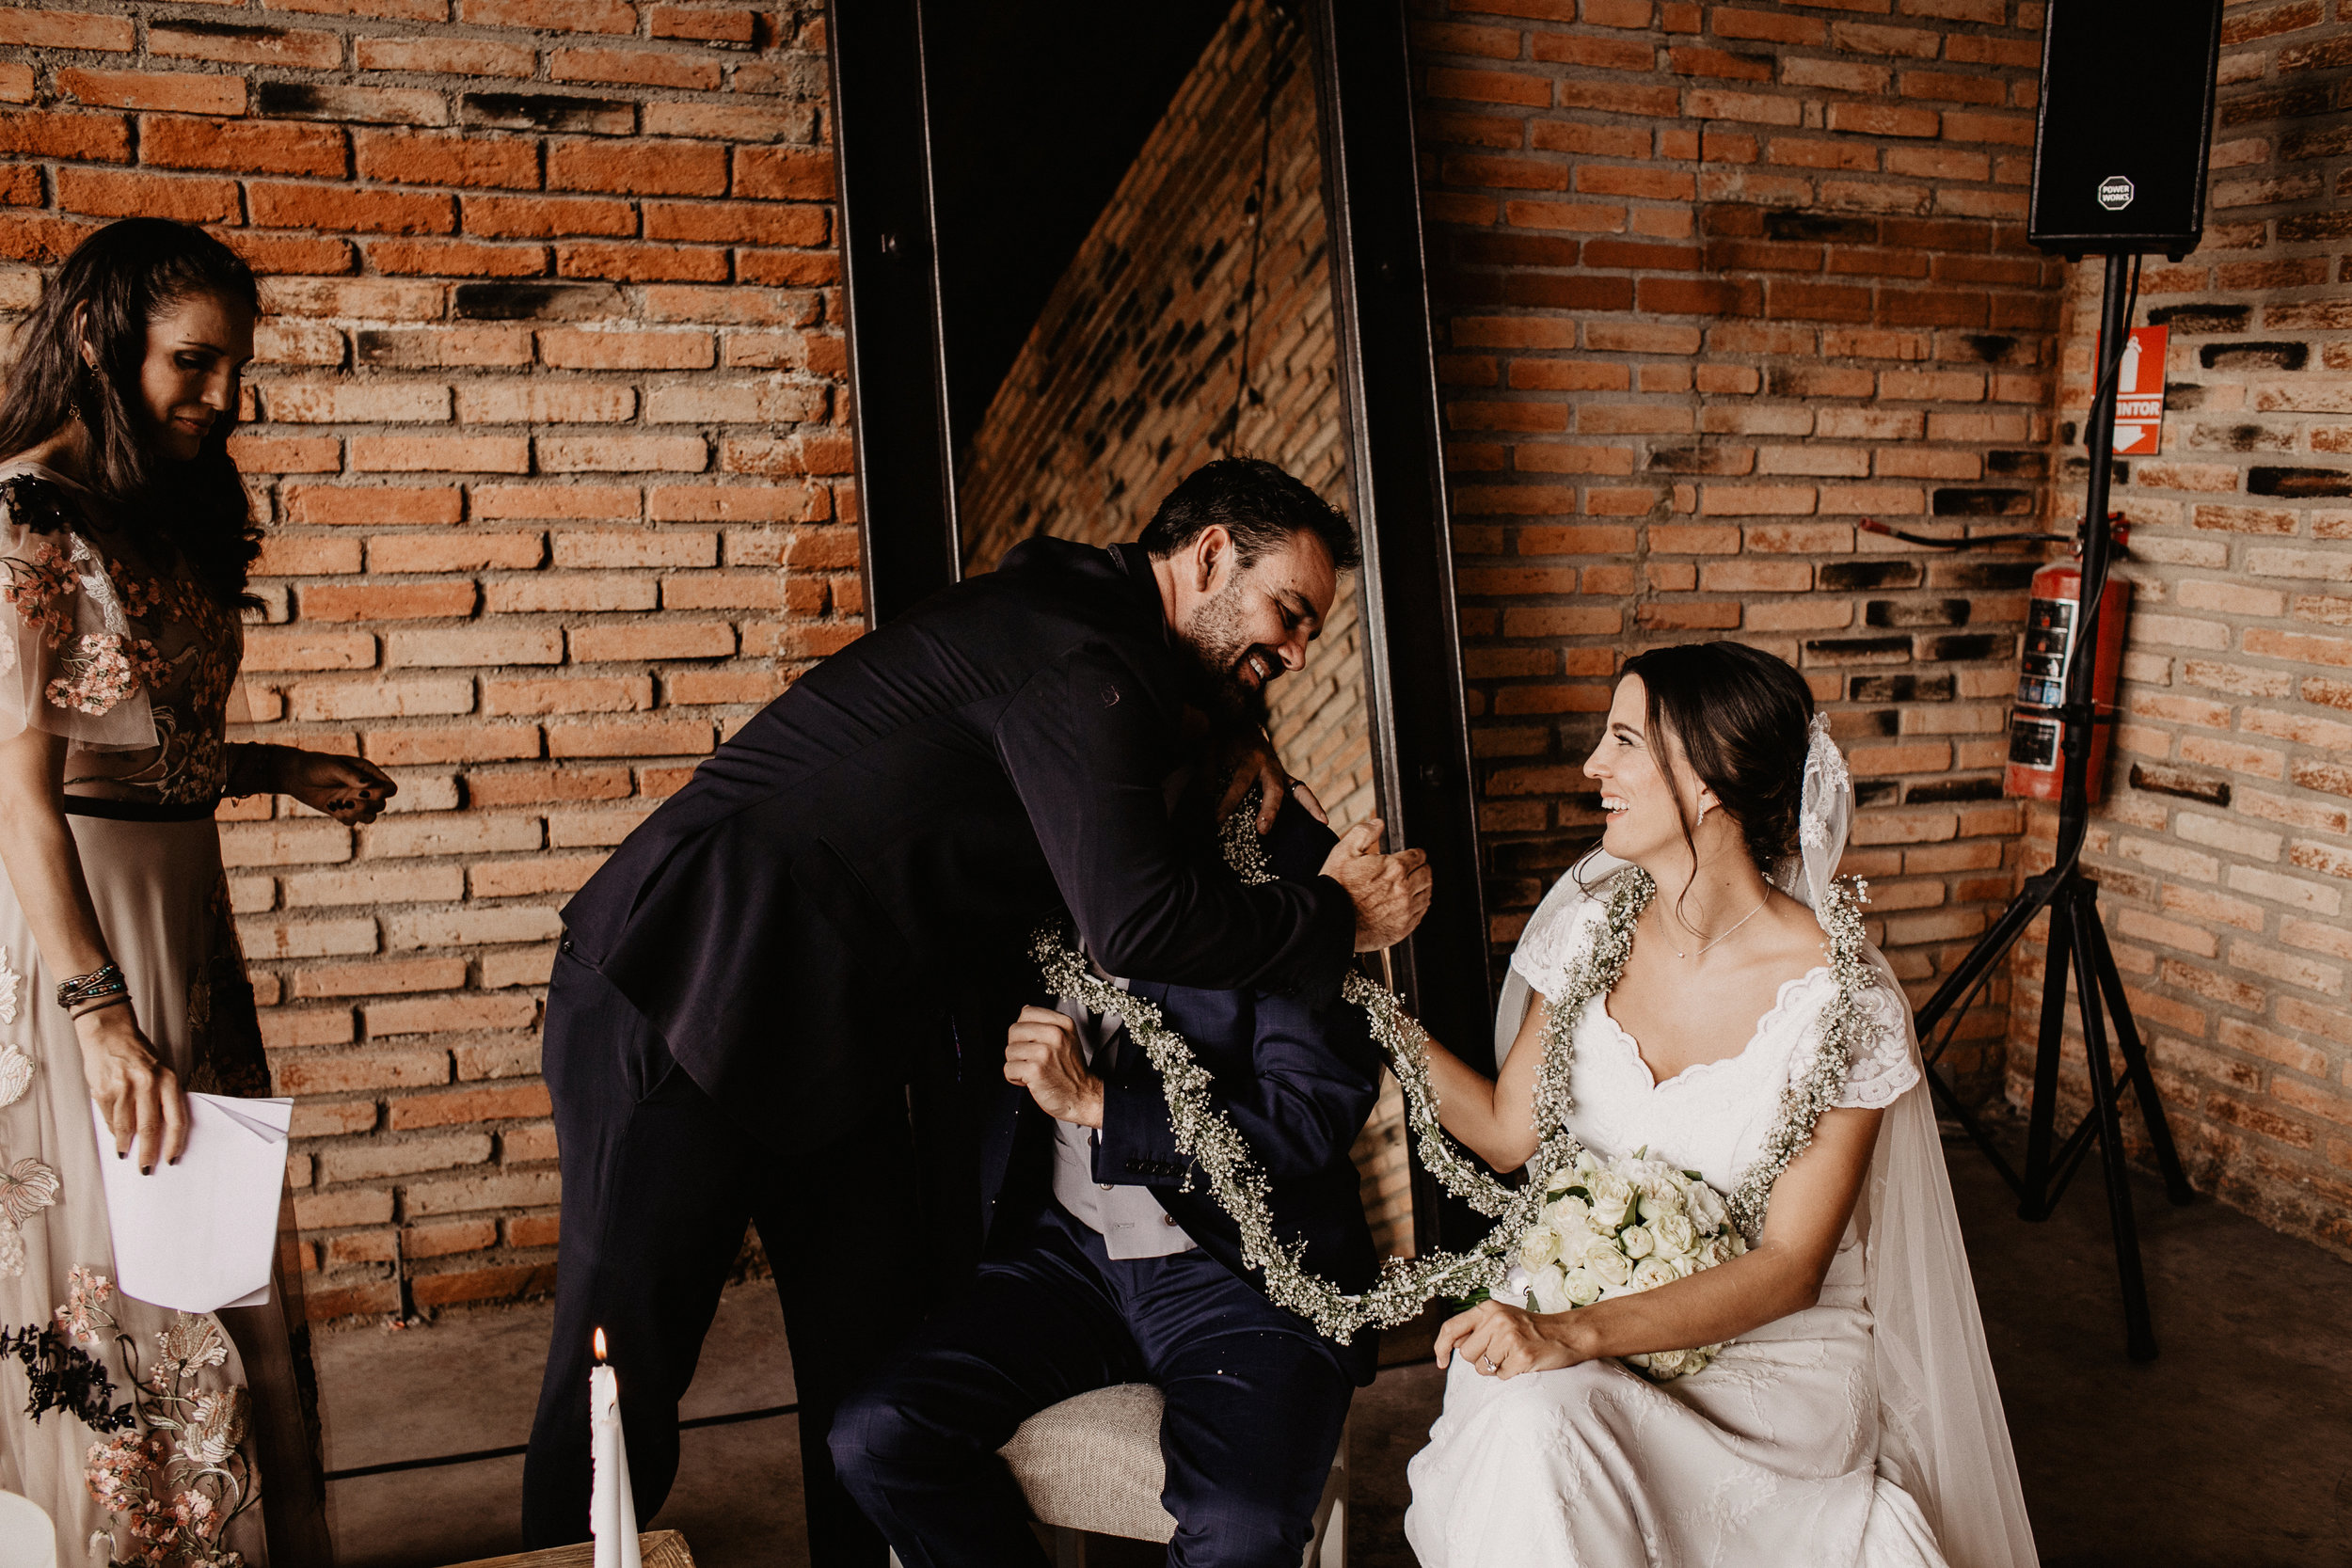 alfonso_flores_destination_wedding_photographer_pau_alonso_611.JPG